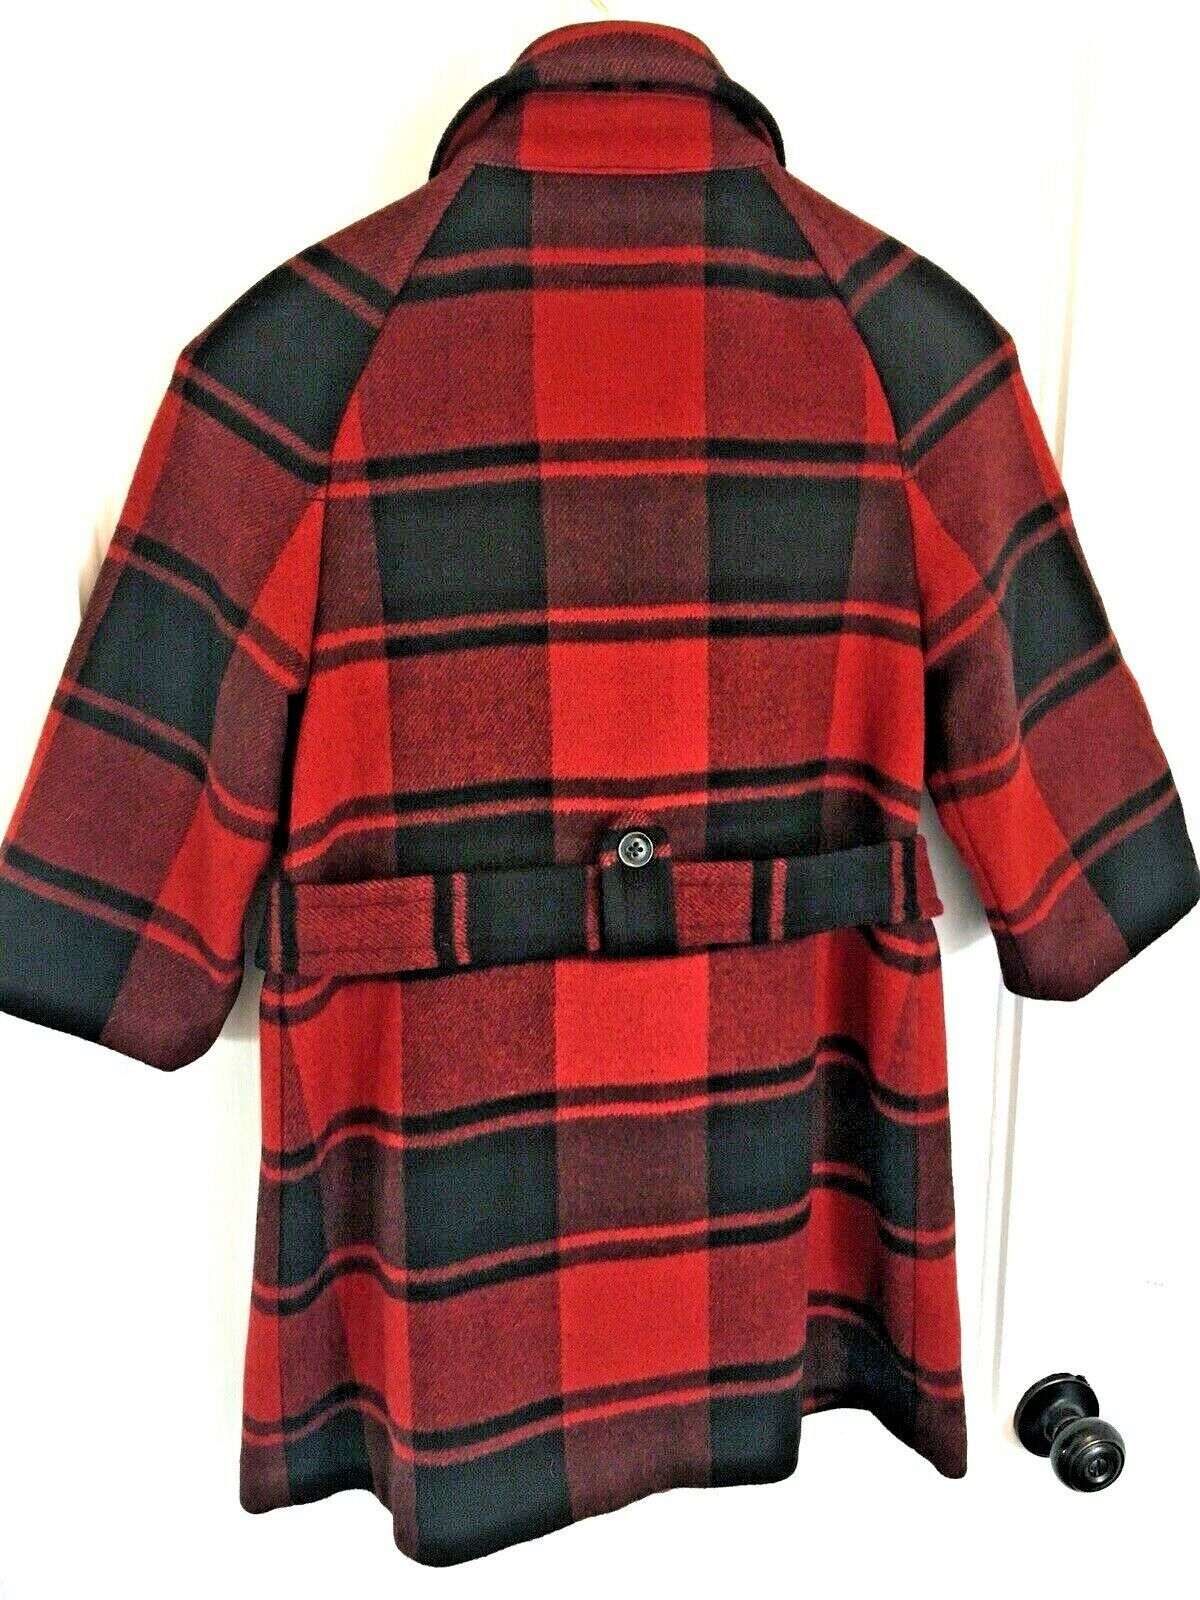 GAP Buffalo Check Red & Black 3/4 Sleeve Plaid Wool Pea Coat Jacket SIZE XS